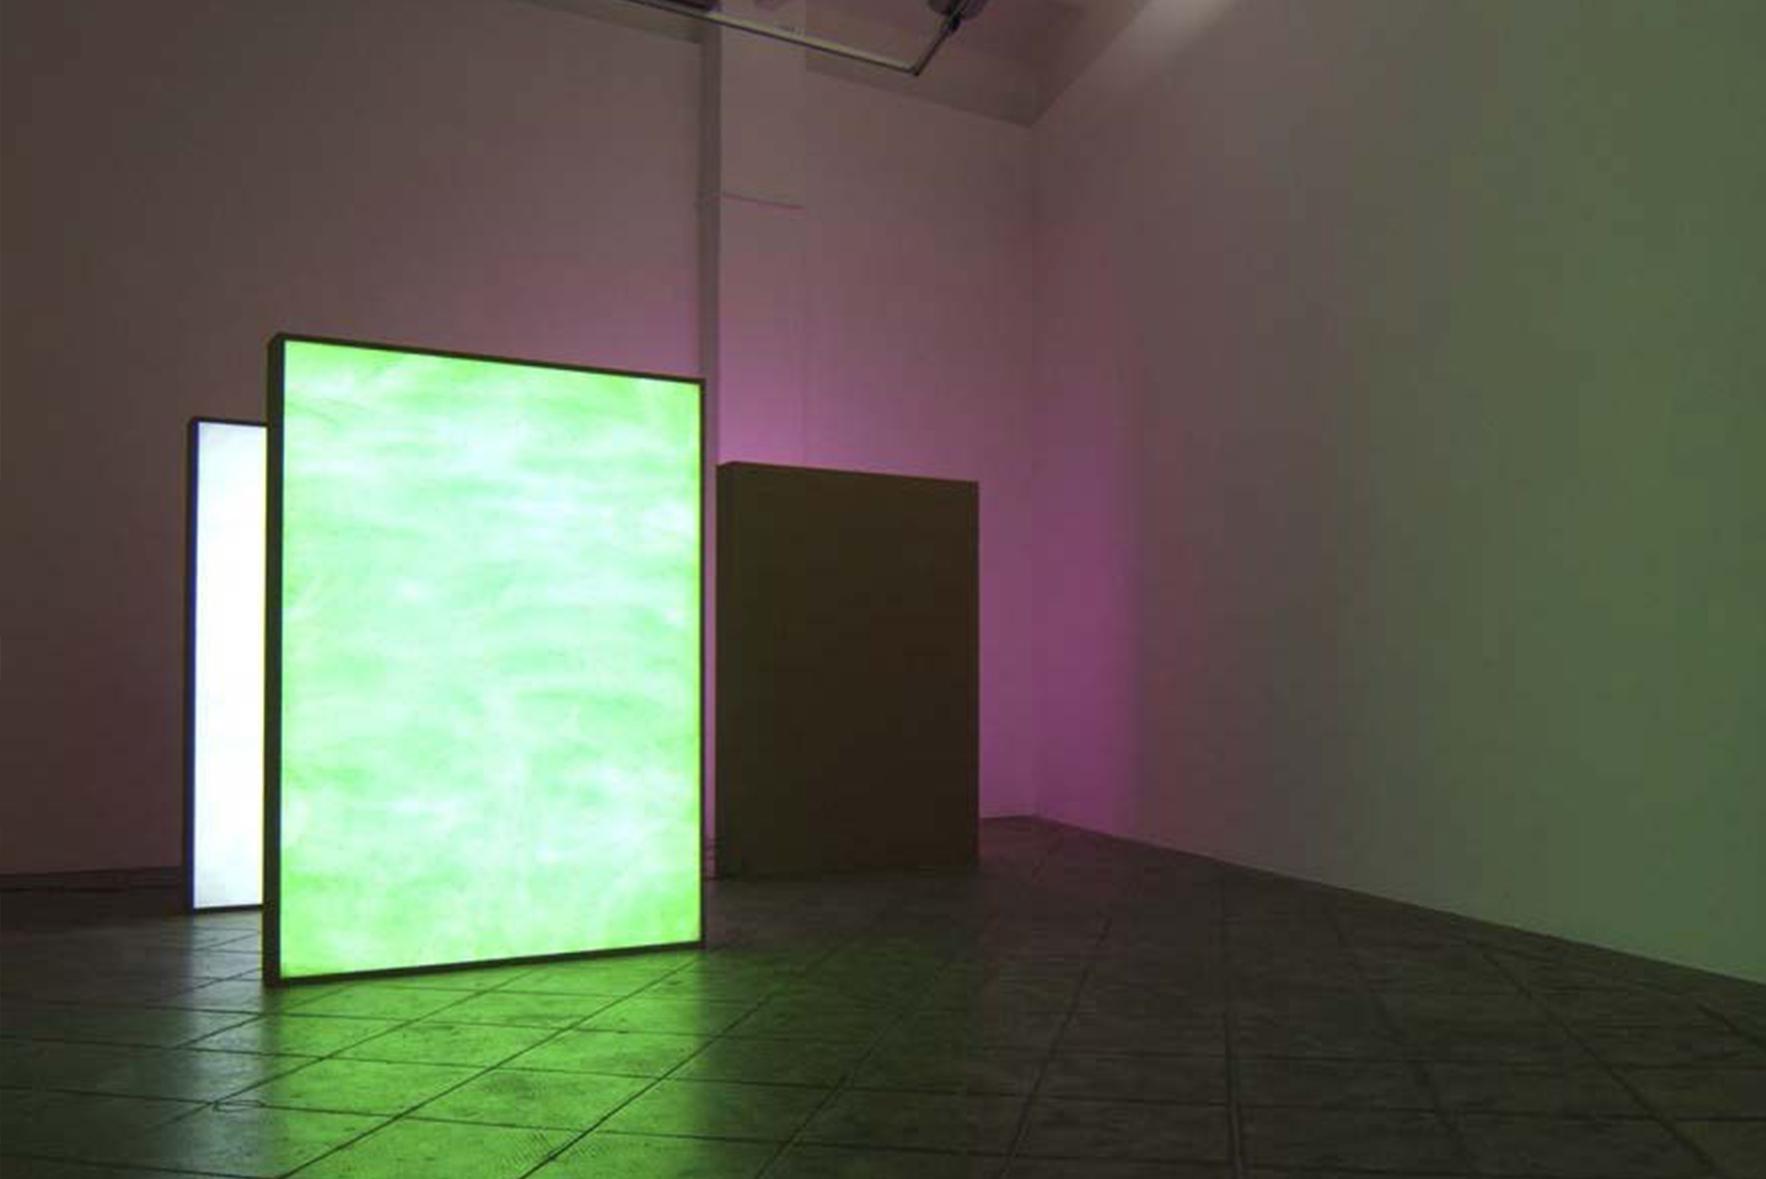 Untitled, 2005 |  | ProjecteSD